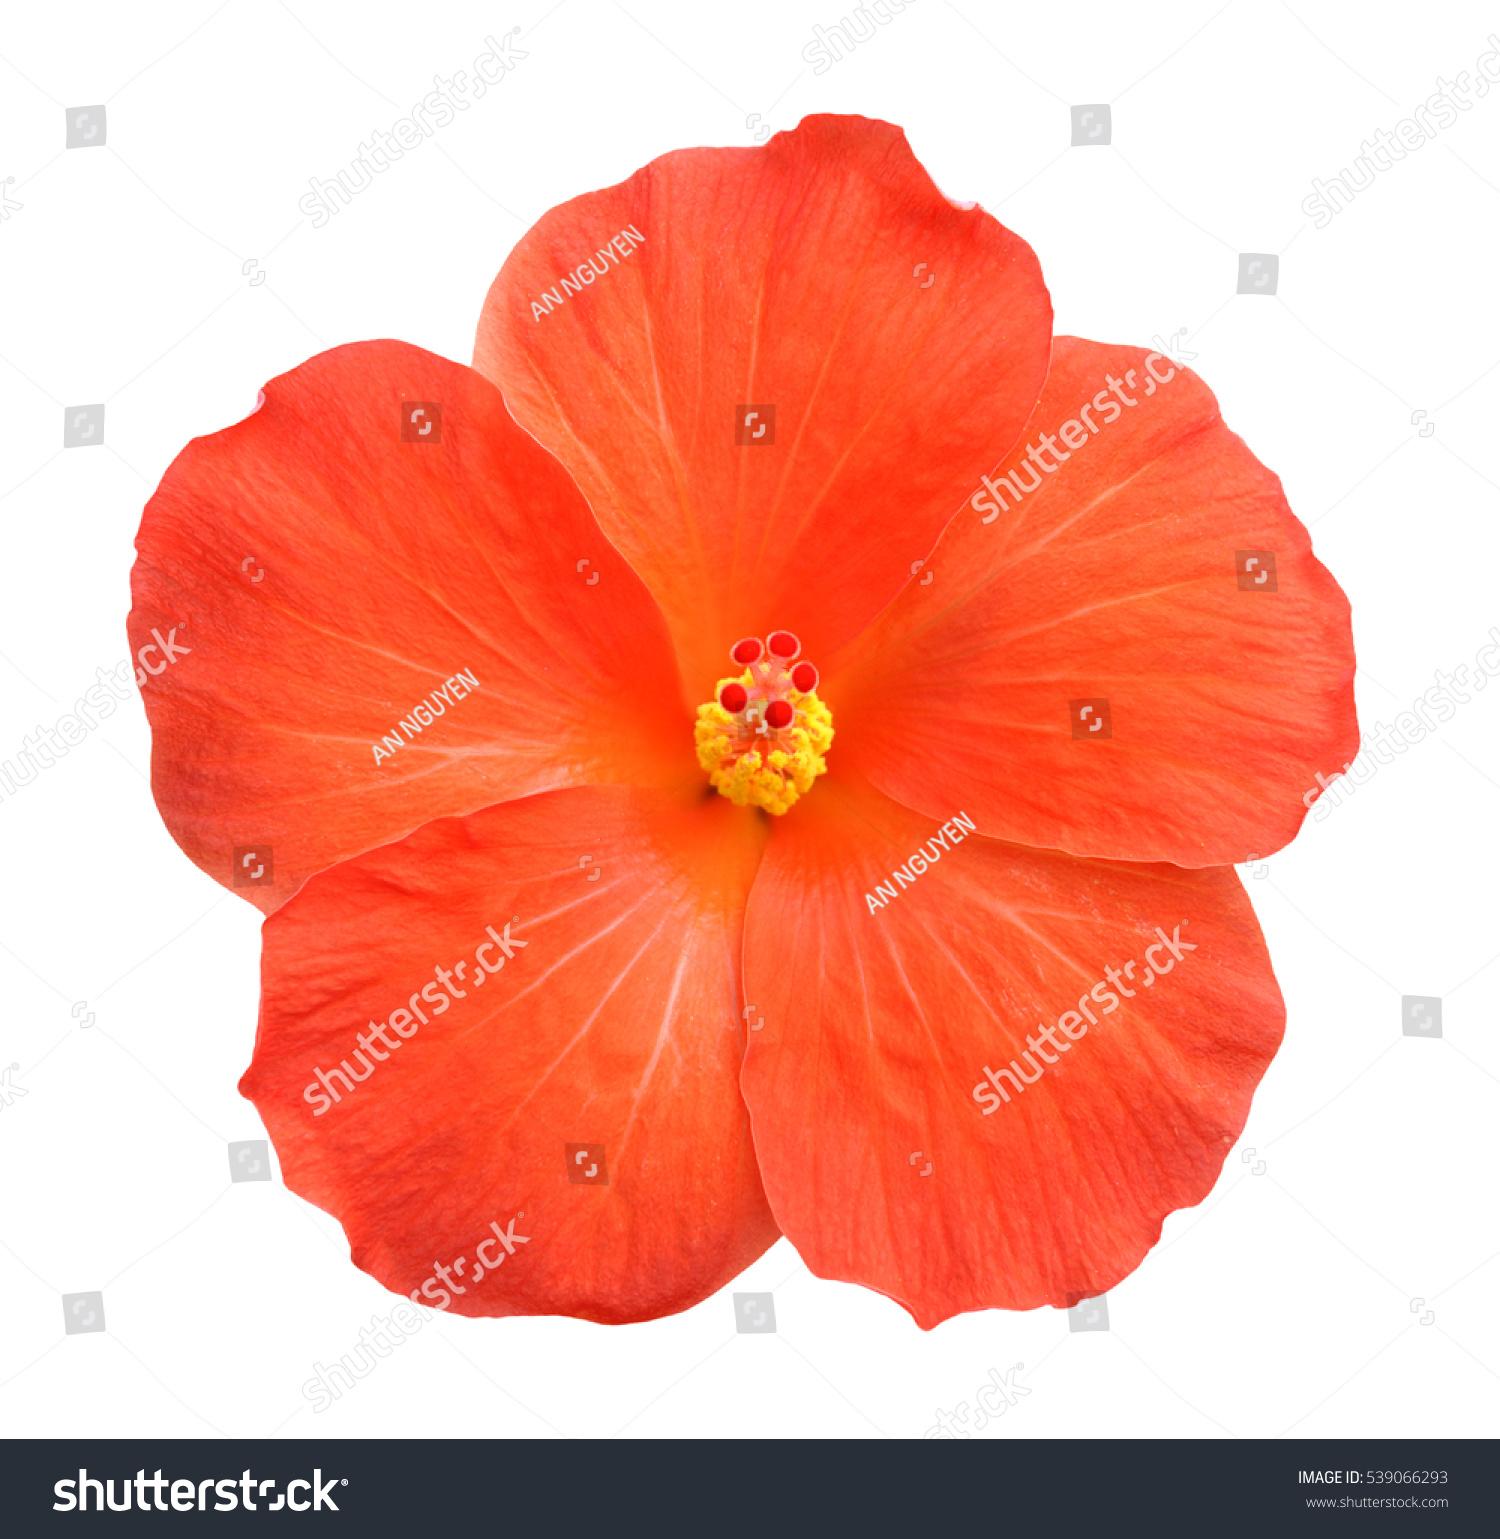 stock-photo-beautiful-single-orange-hibi